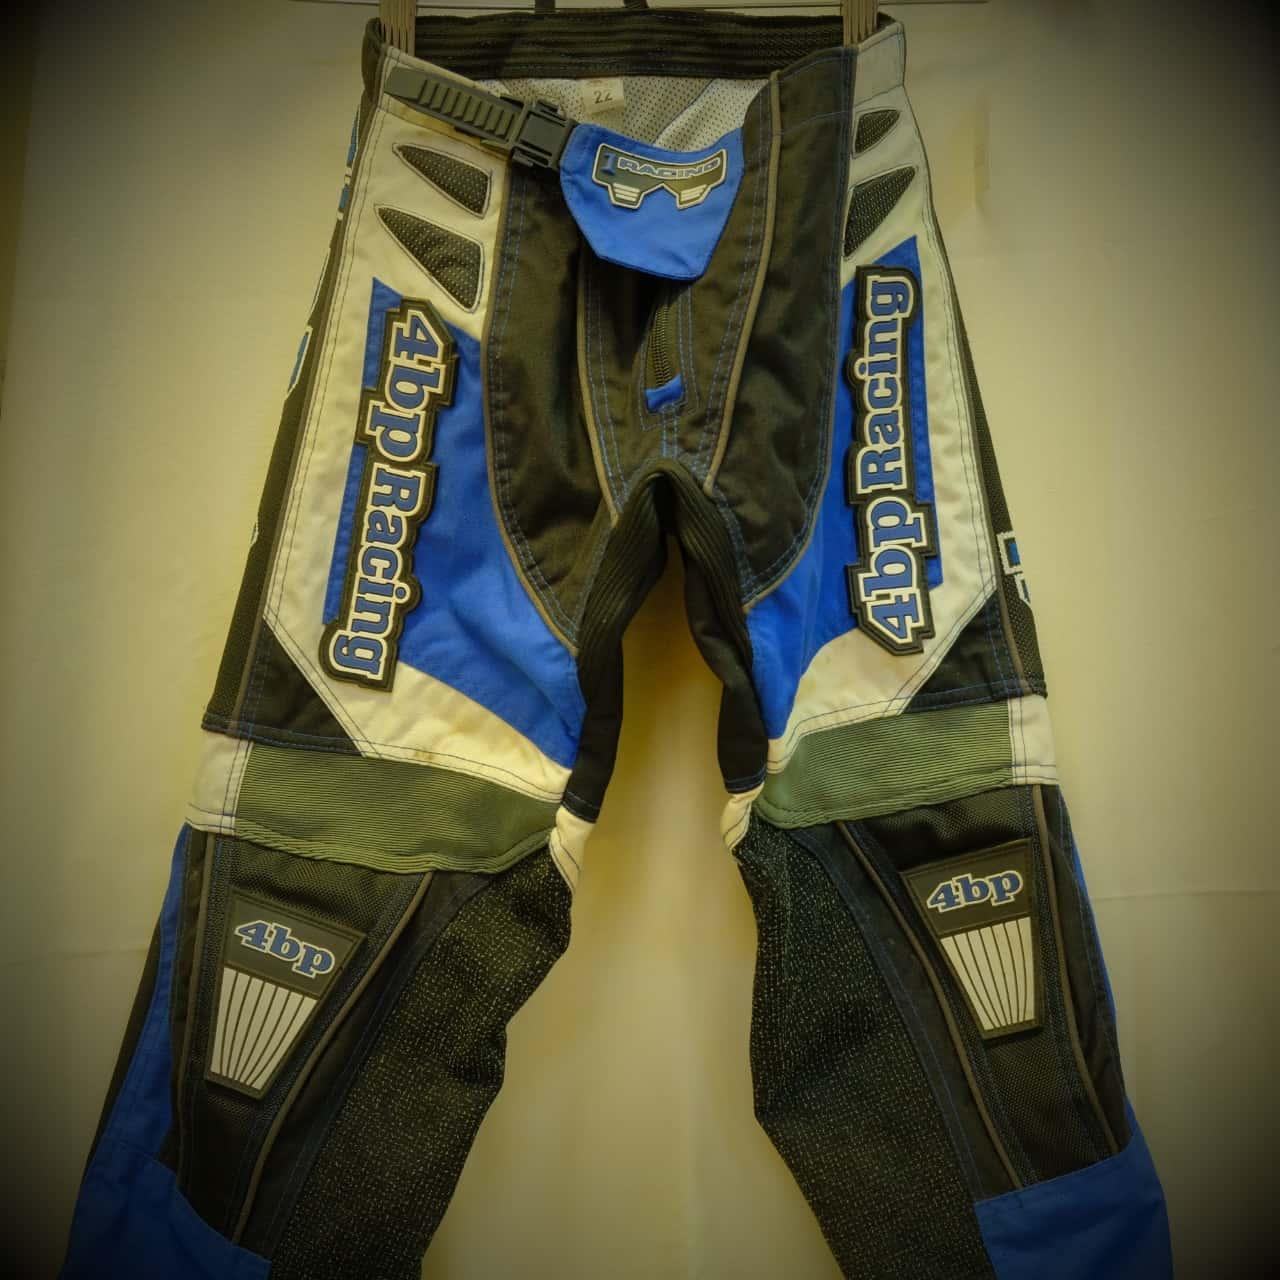 BMX/Motocross Racing Gear